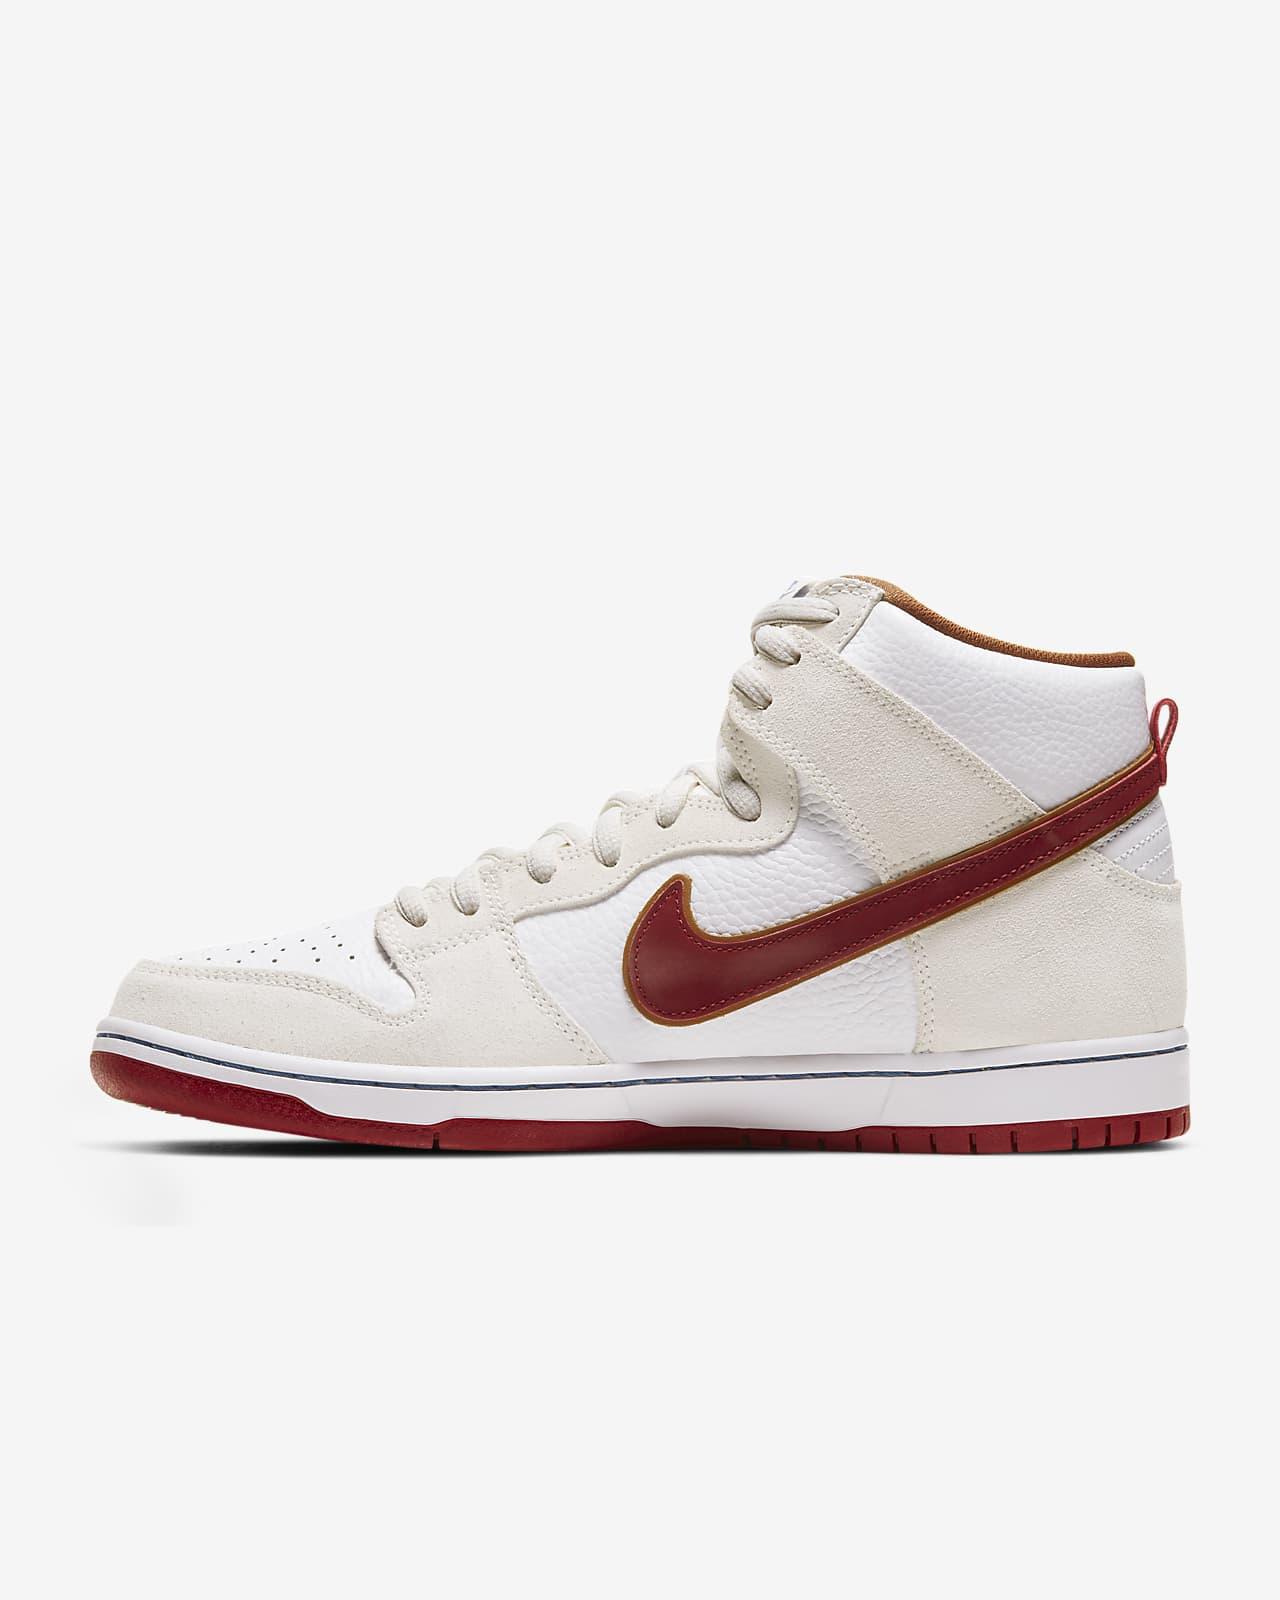 Al frente Continente alimentar  Nike SB Dunk High Pro Skate Shoe. Nike ID